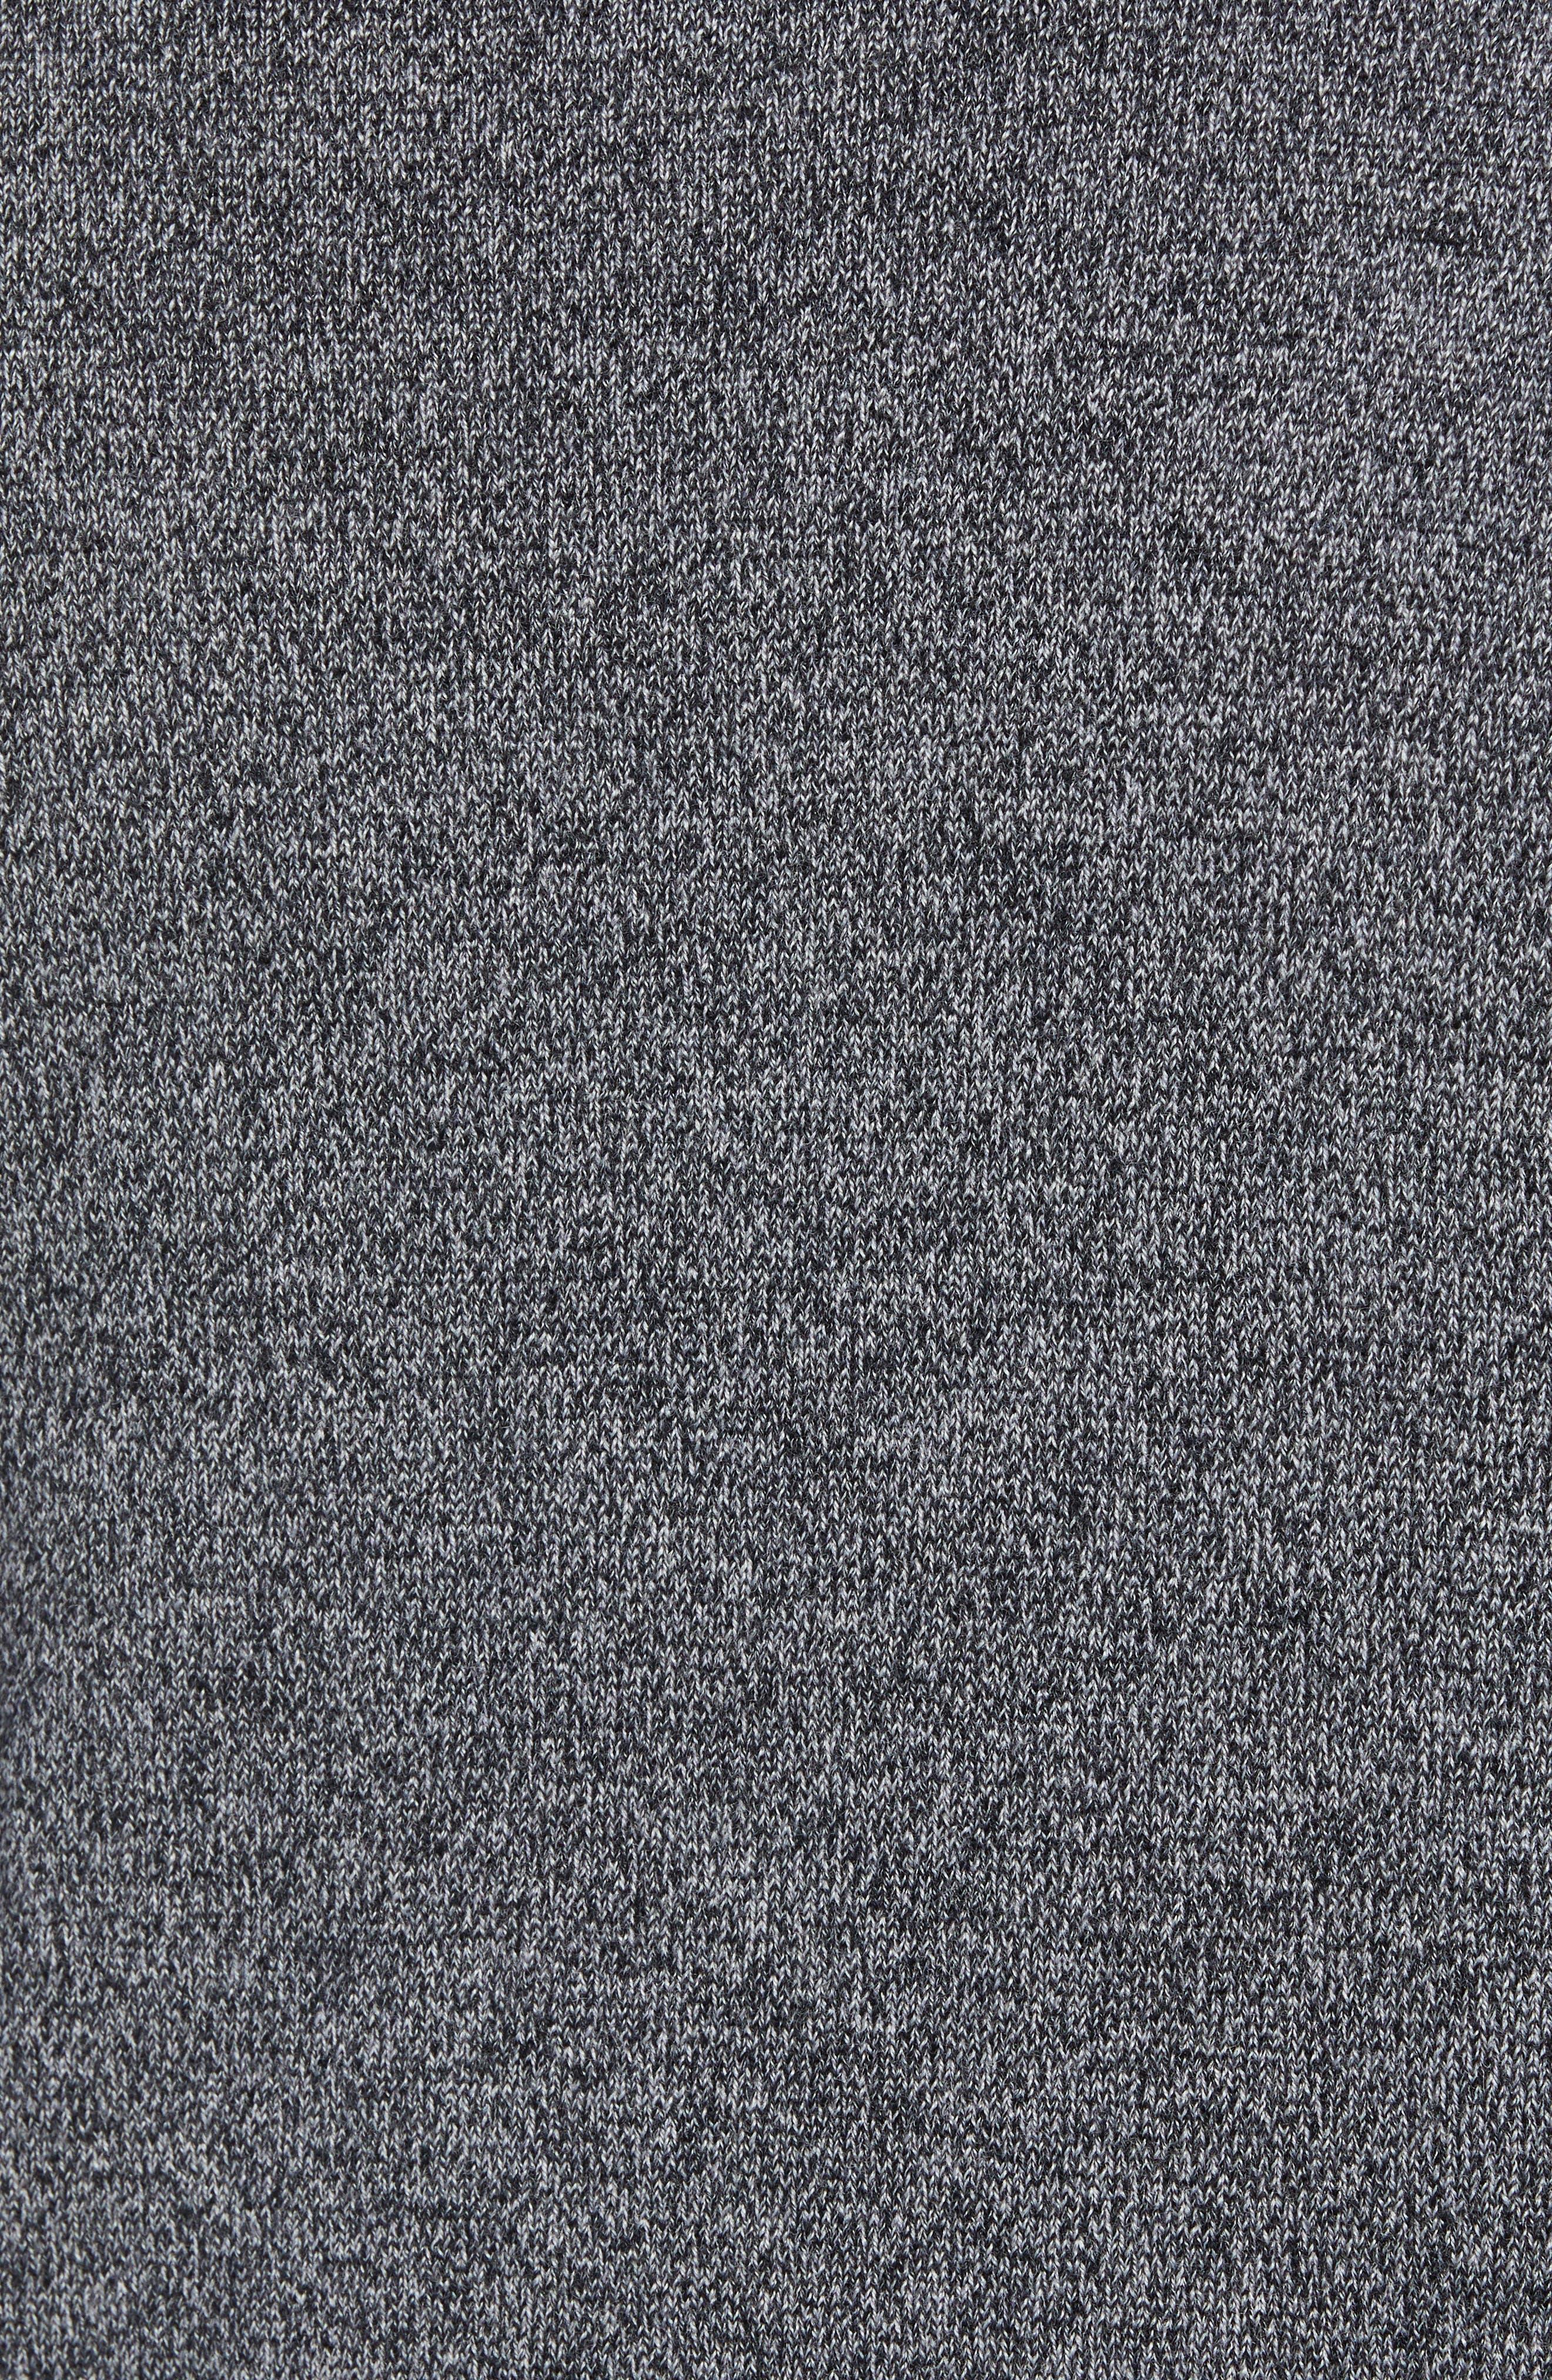 Slim Fit Turtleneck Merino Wool Sweater,                             Alternate thumbnail 5, color,                             CHARCOAL MARL